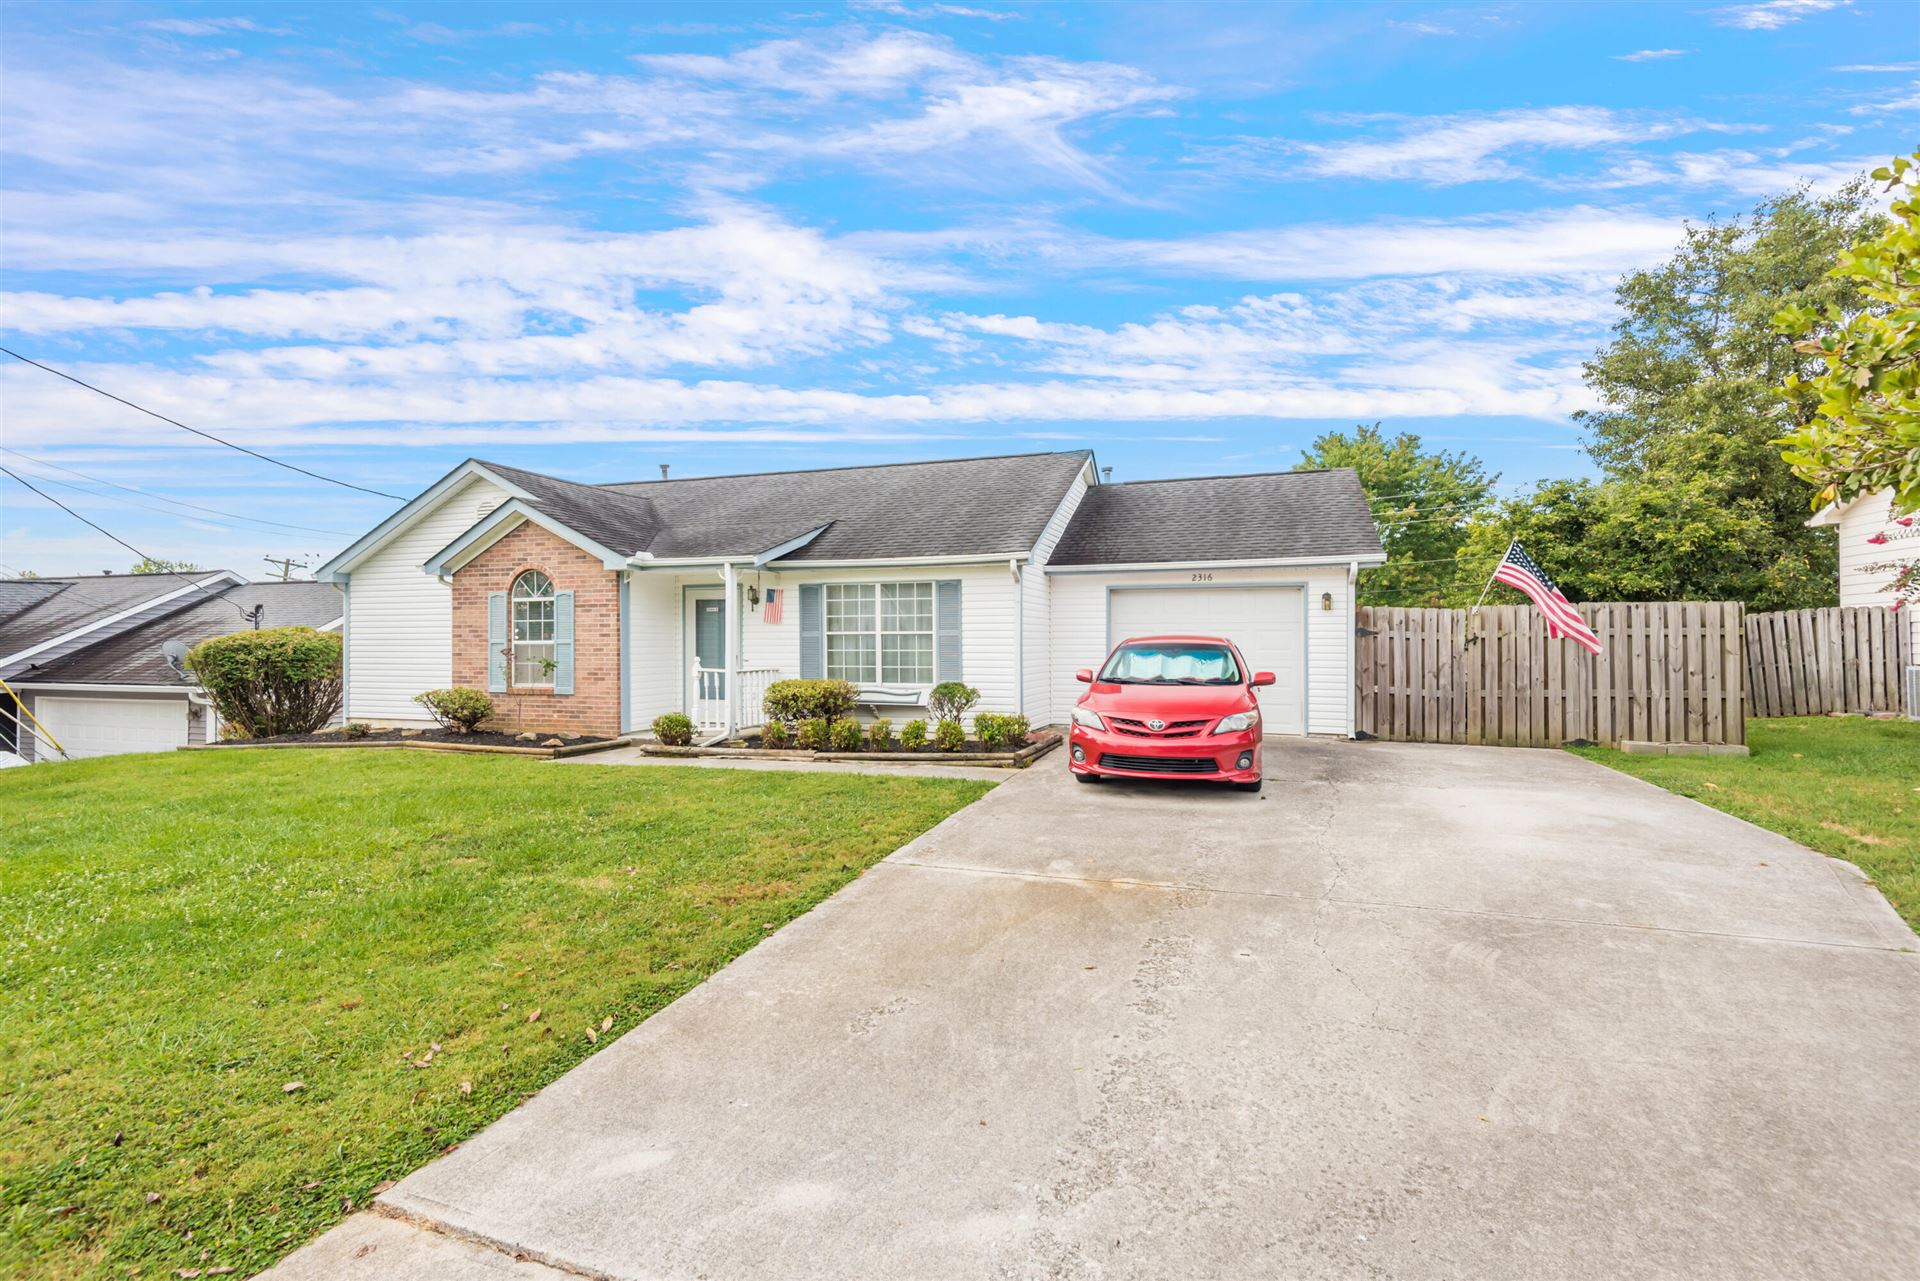 Photo of 2316 Bainbridge Way, Powell, TN 37849 (MLS # 1167857)